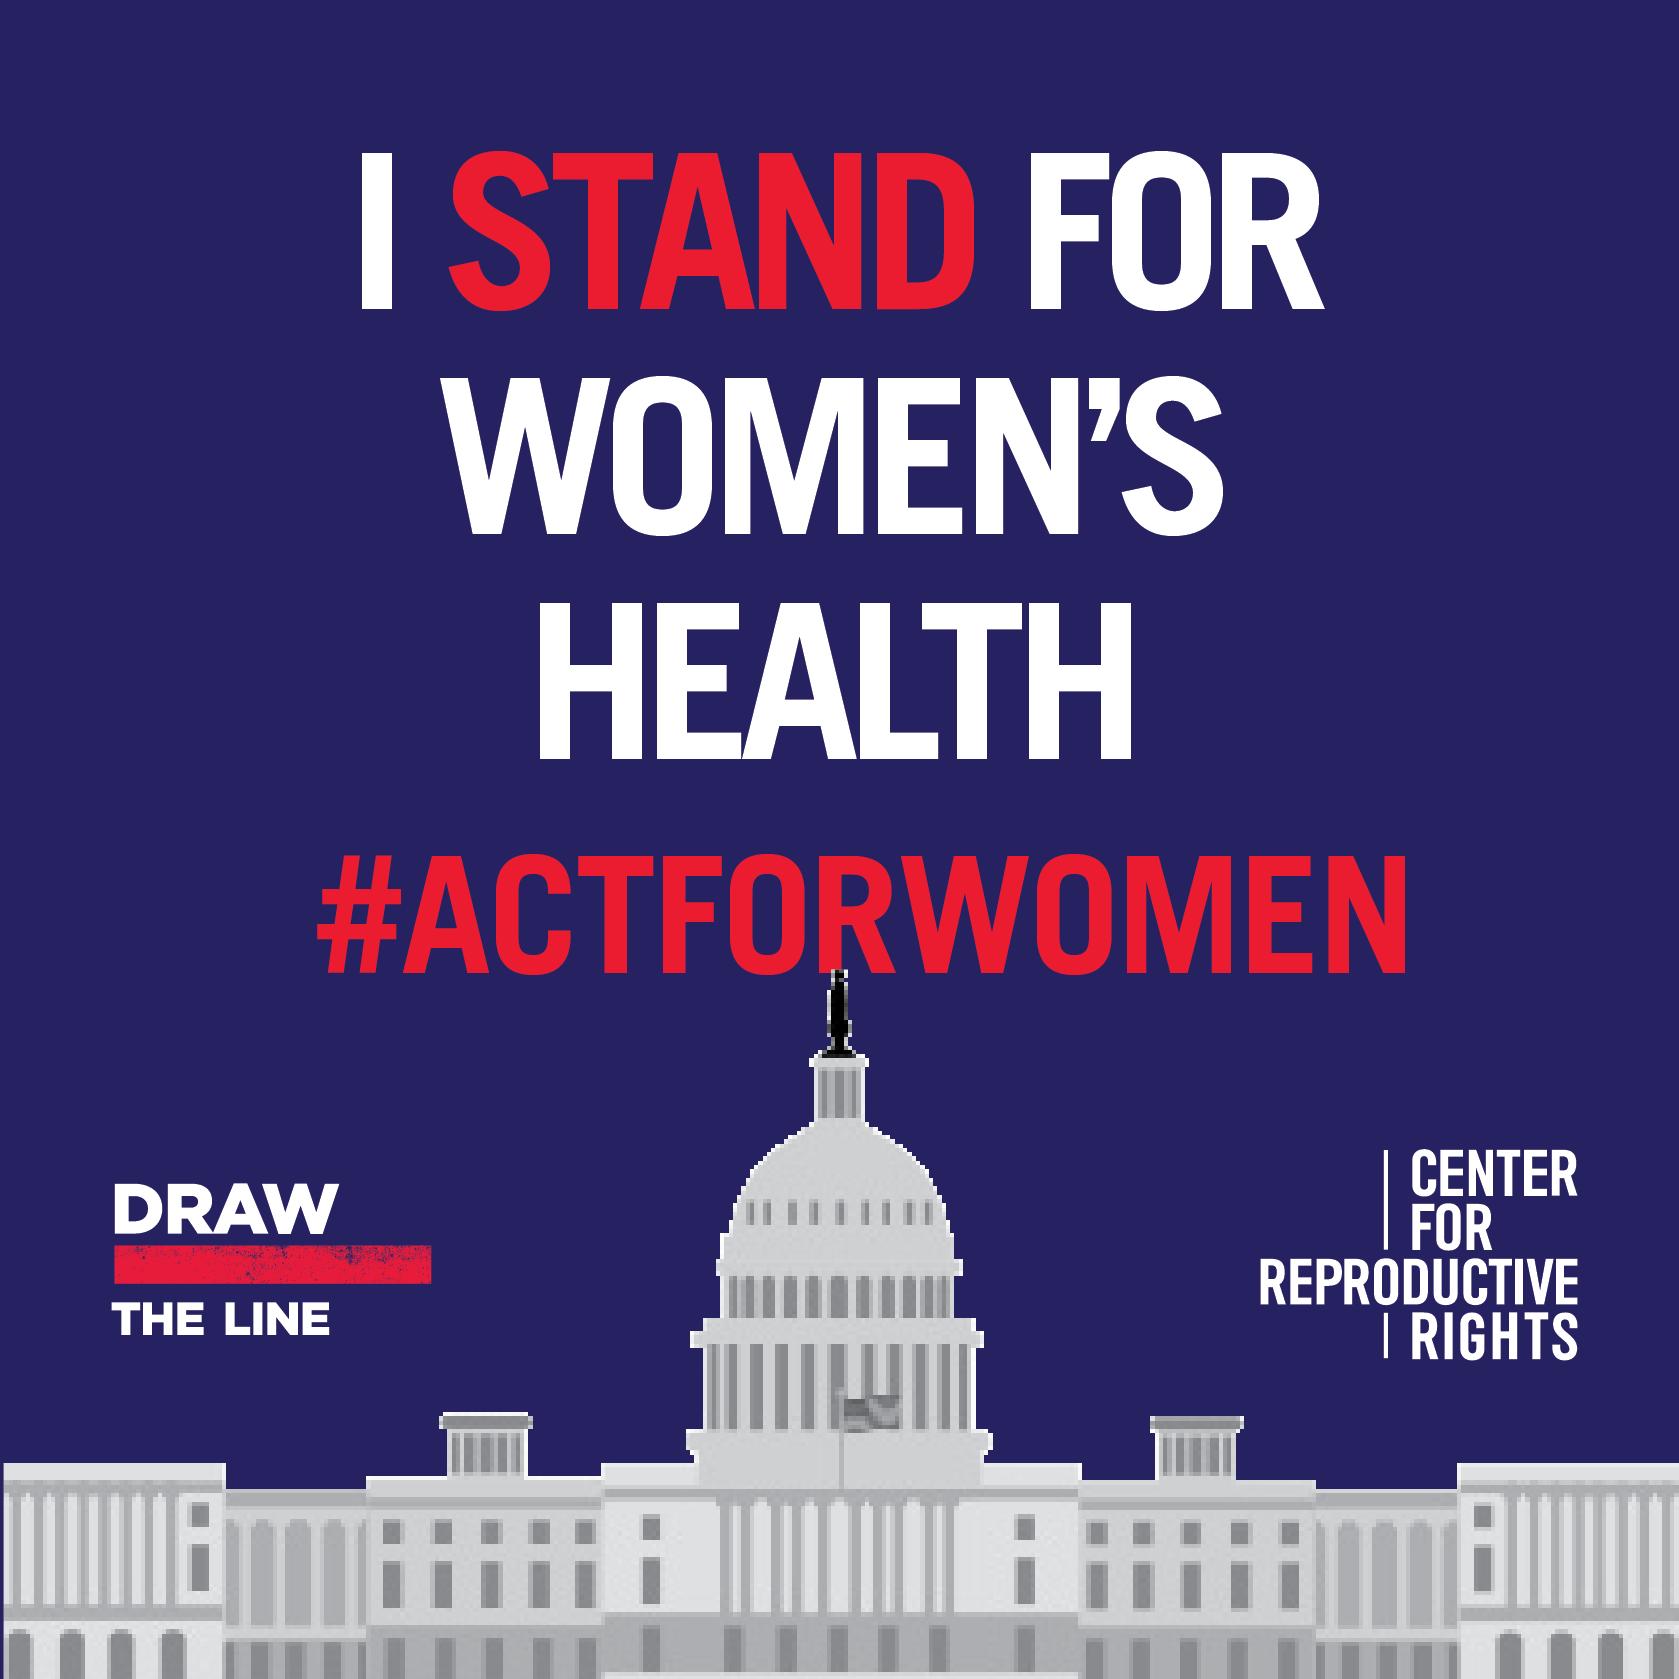 I Stand for women's health. #ActForWomen